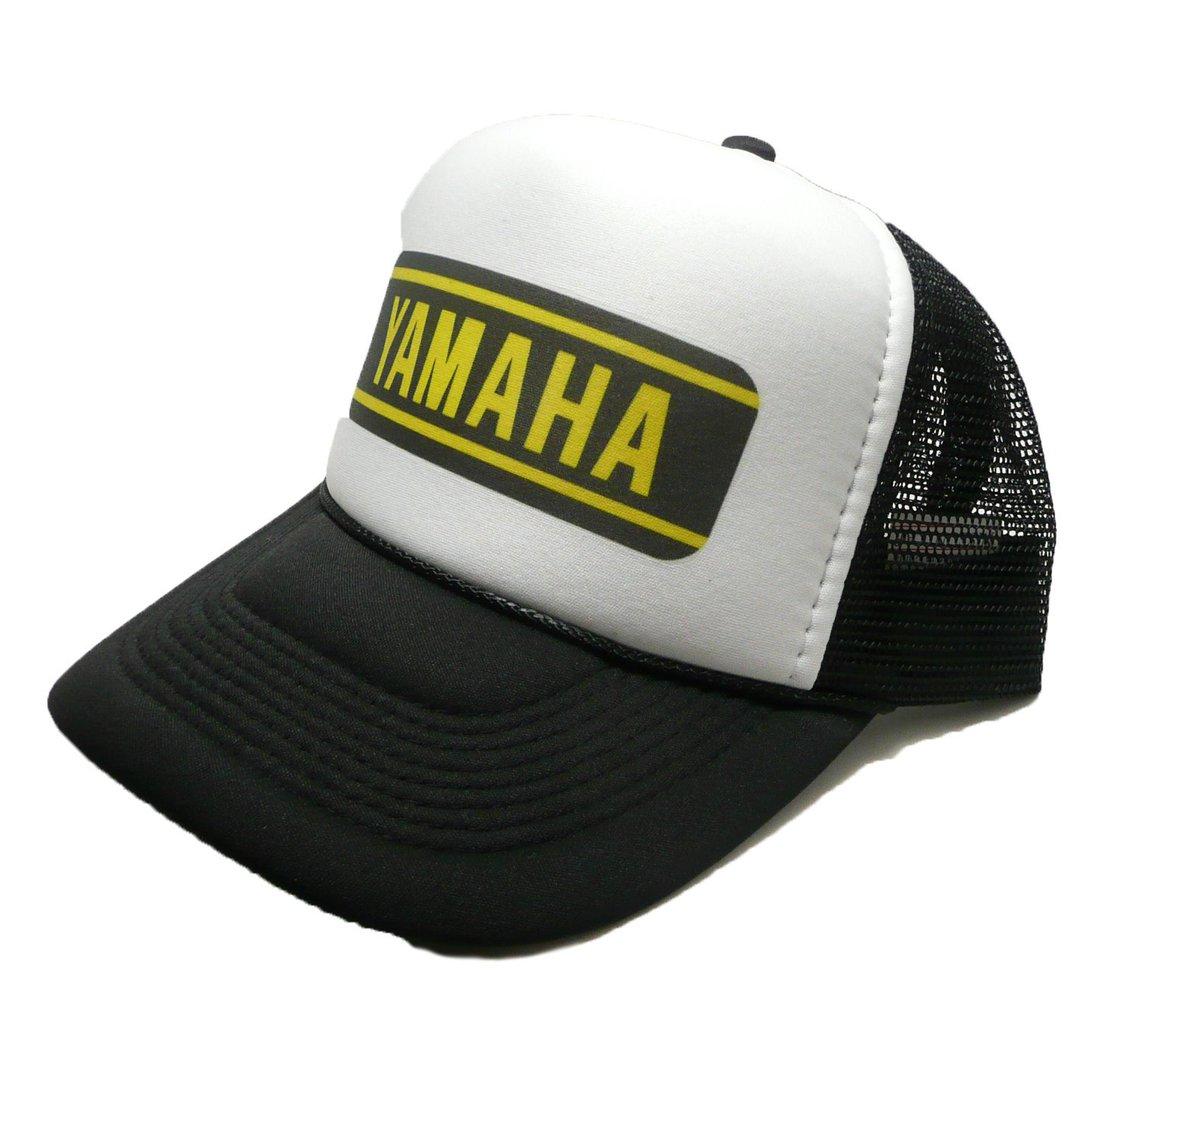 6e2a64abbf9 ... shop  Vintage Yamaha motocross hat trucker hat adjustable snapback  racing hat black new unworn motorcycles hat https   etsy.me 2GMvtmz   accessories  hat ...